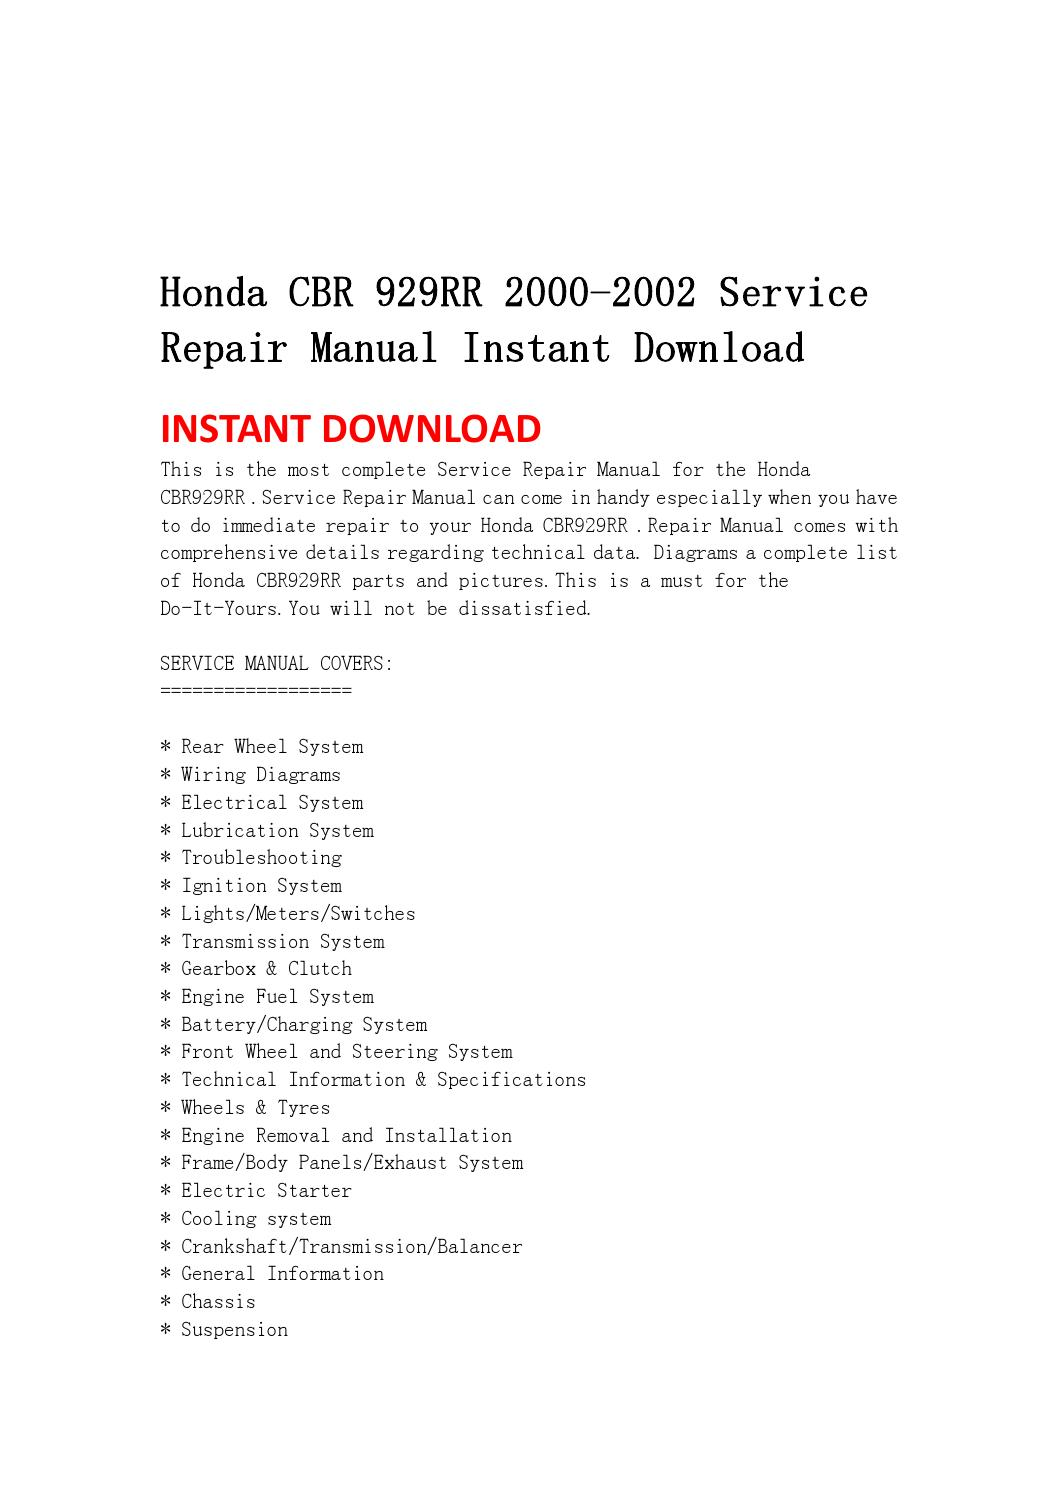 Honda cbr 929rr 2000 2002 service repair manual instant download by